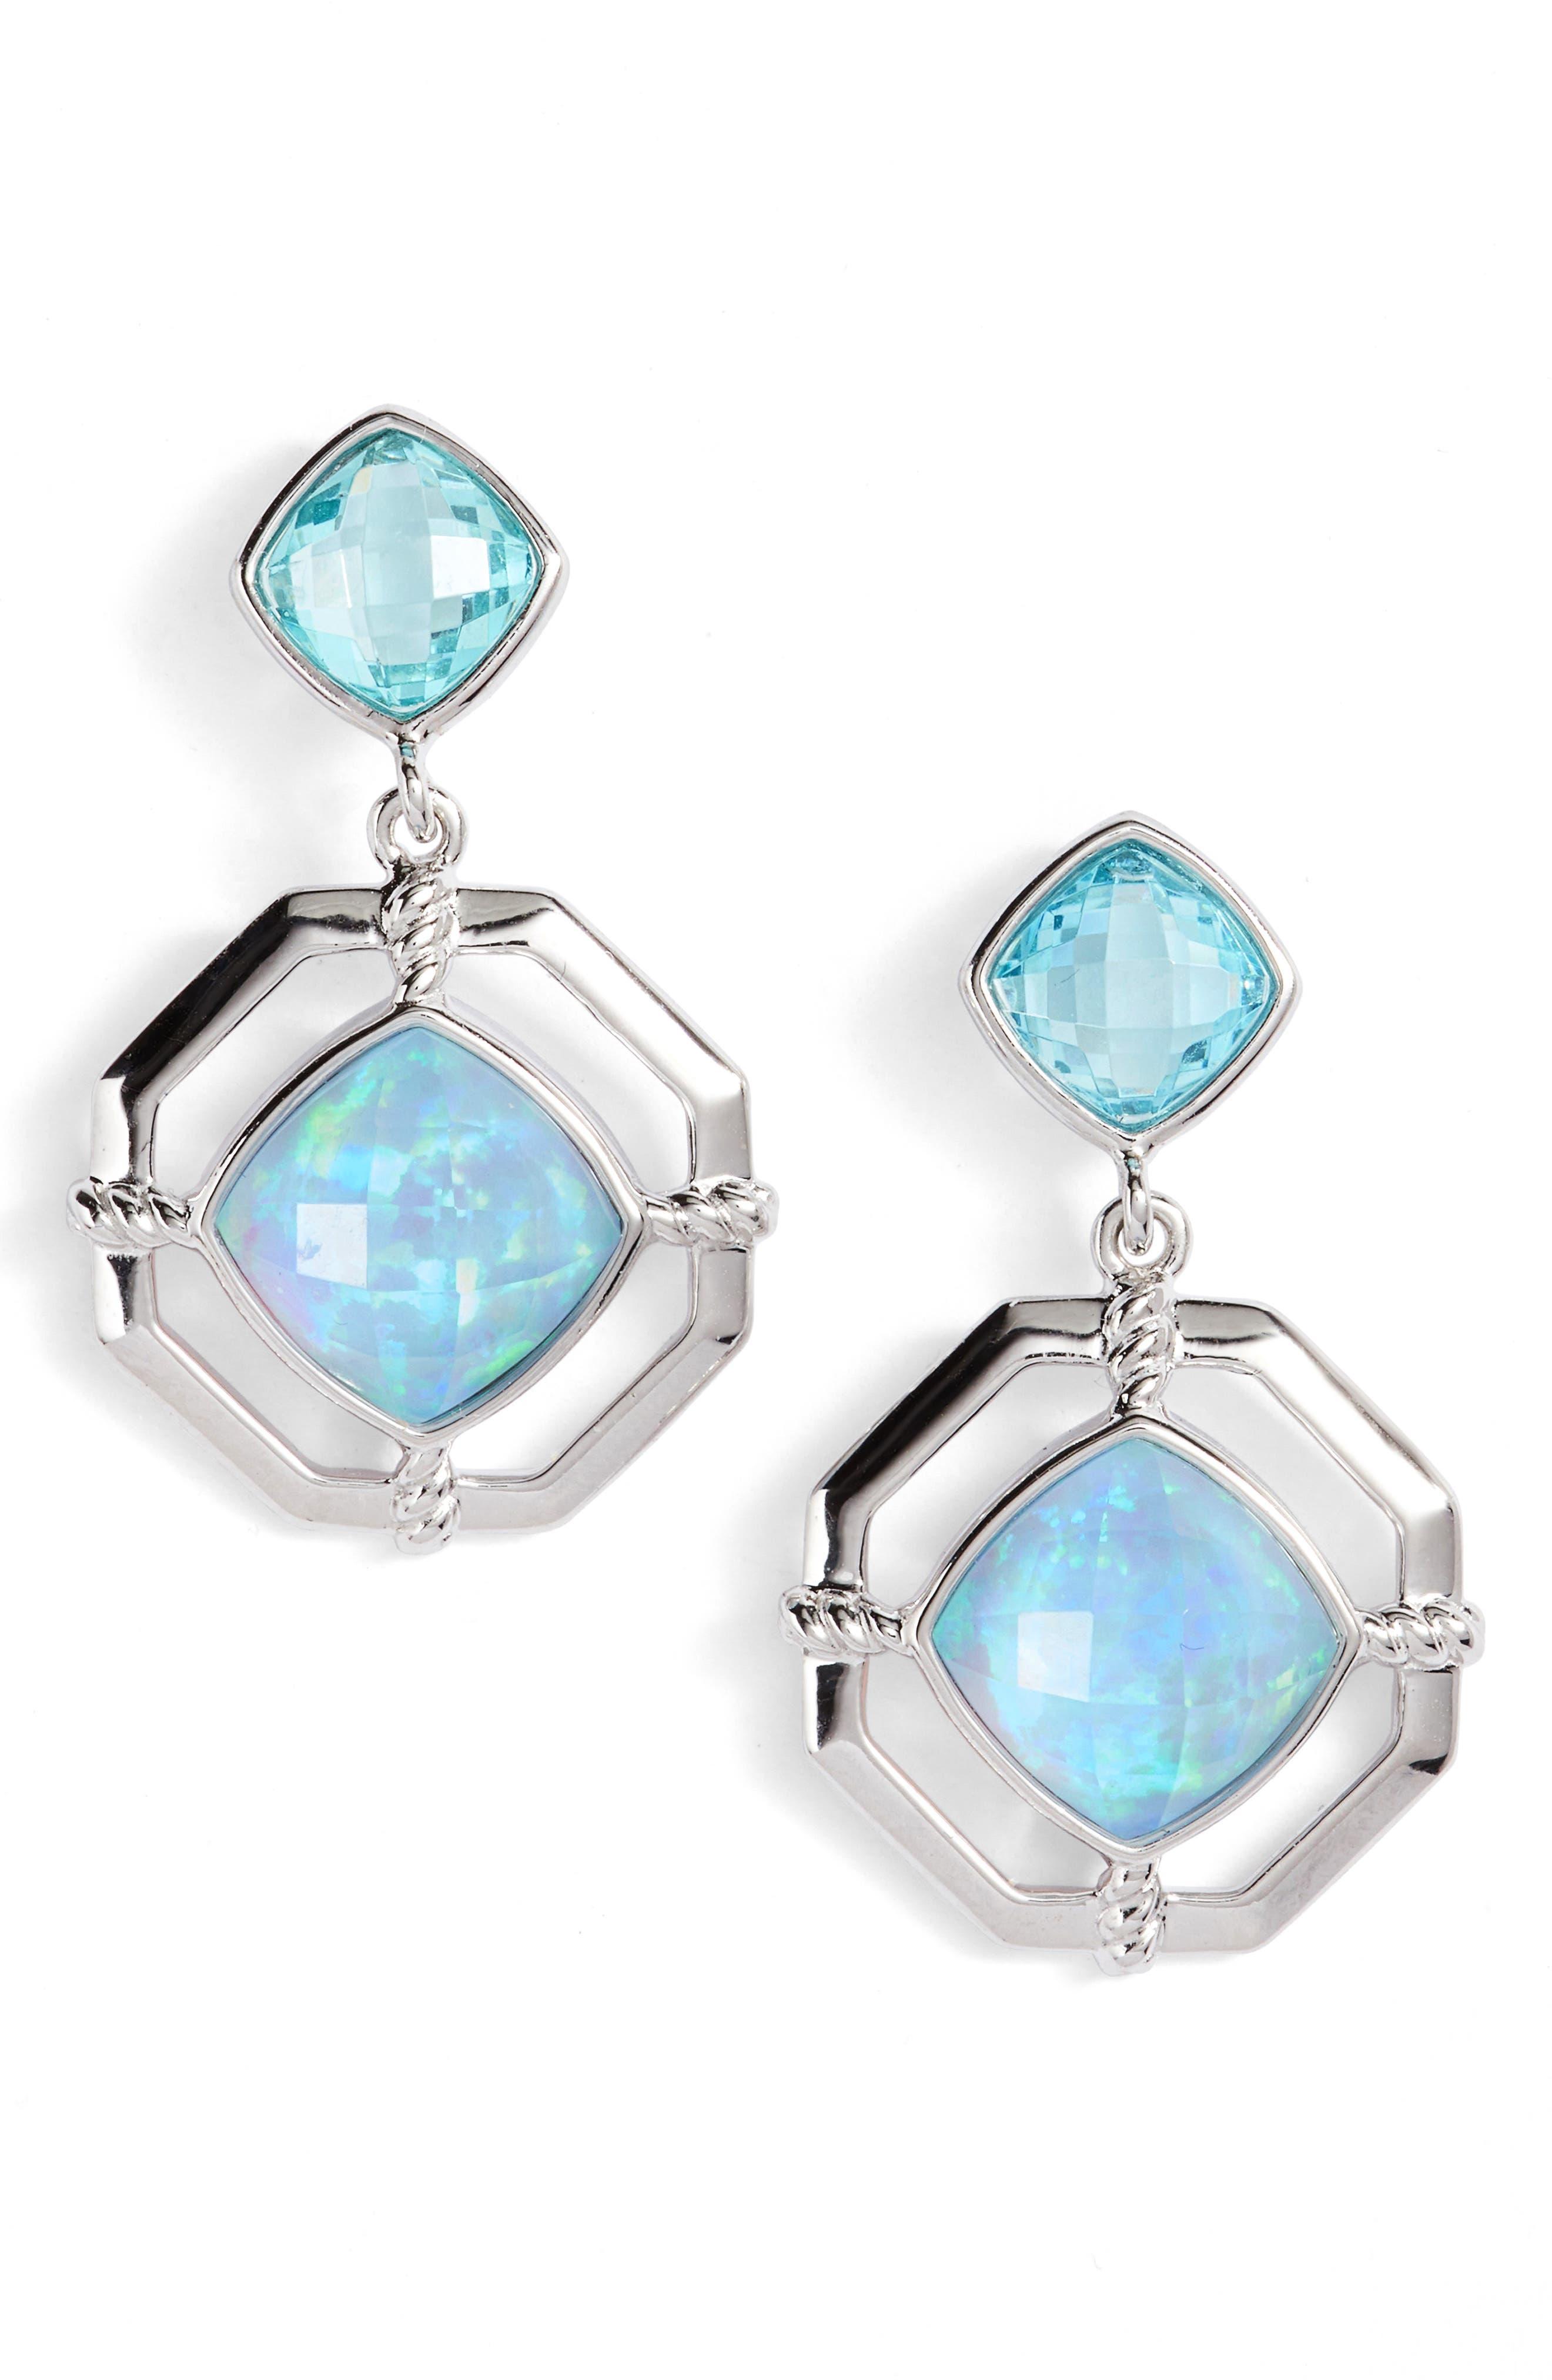 Judith Jack Paradise Double Drop Earrings